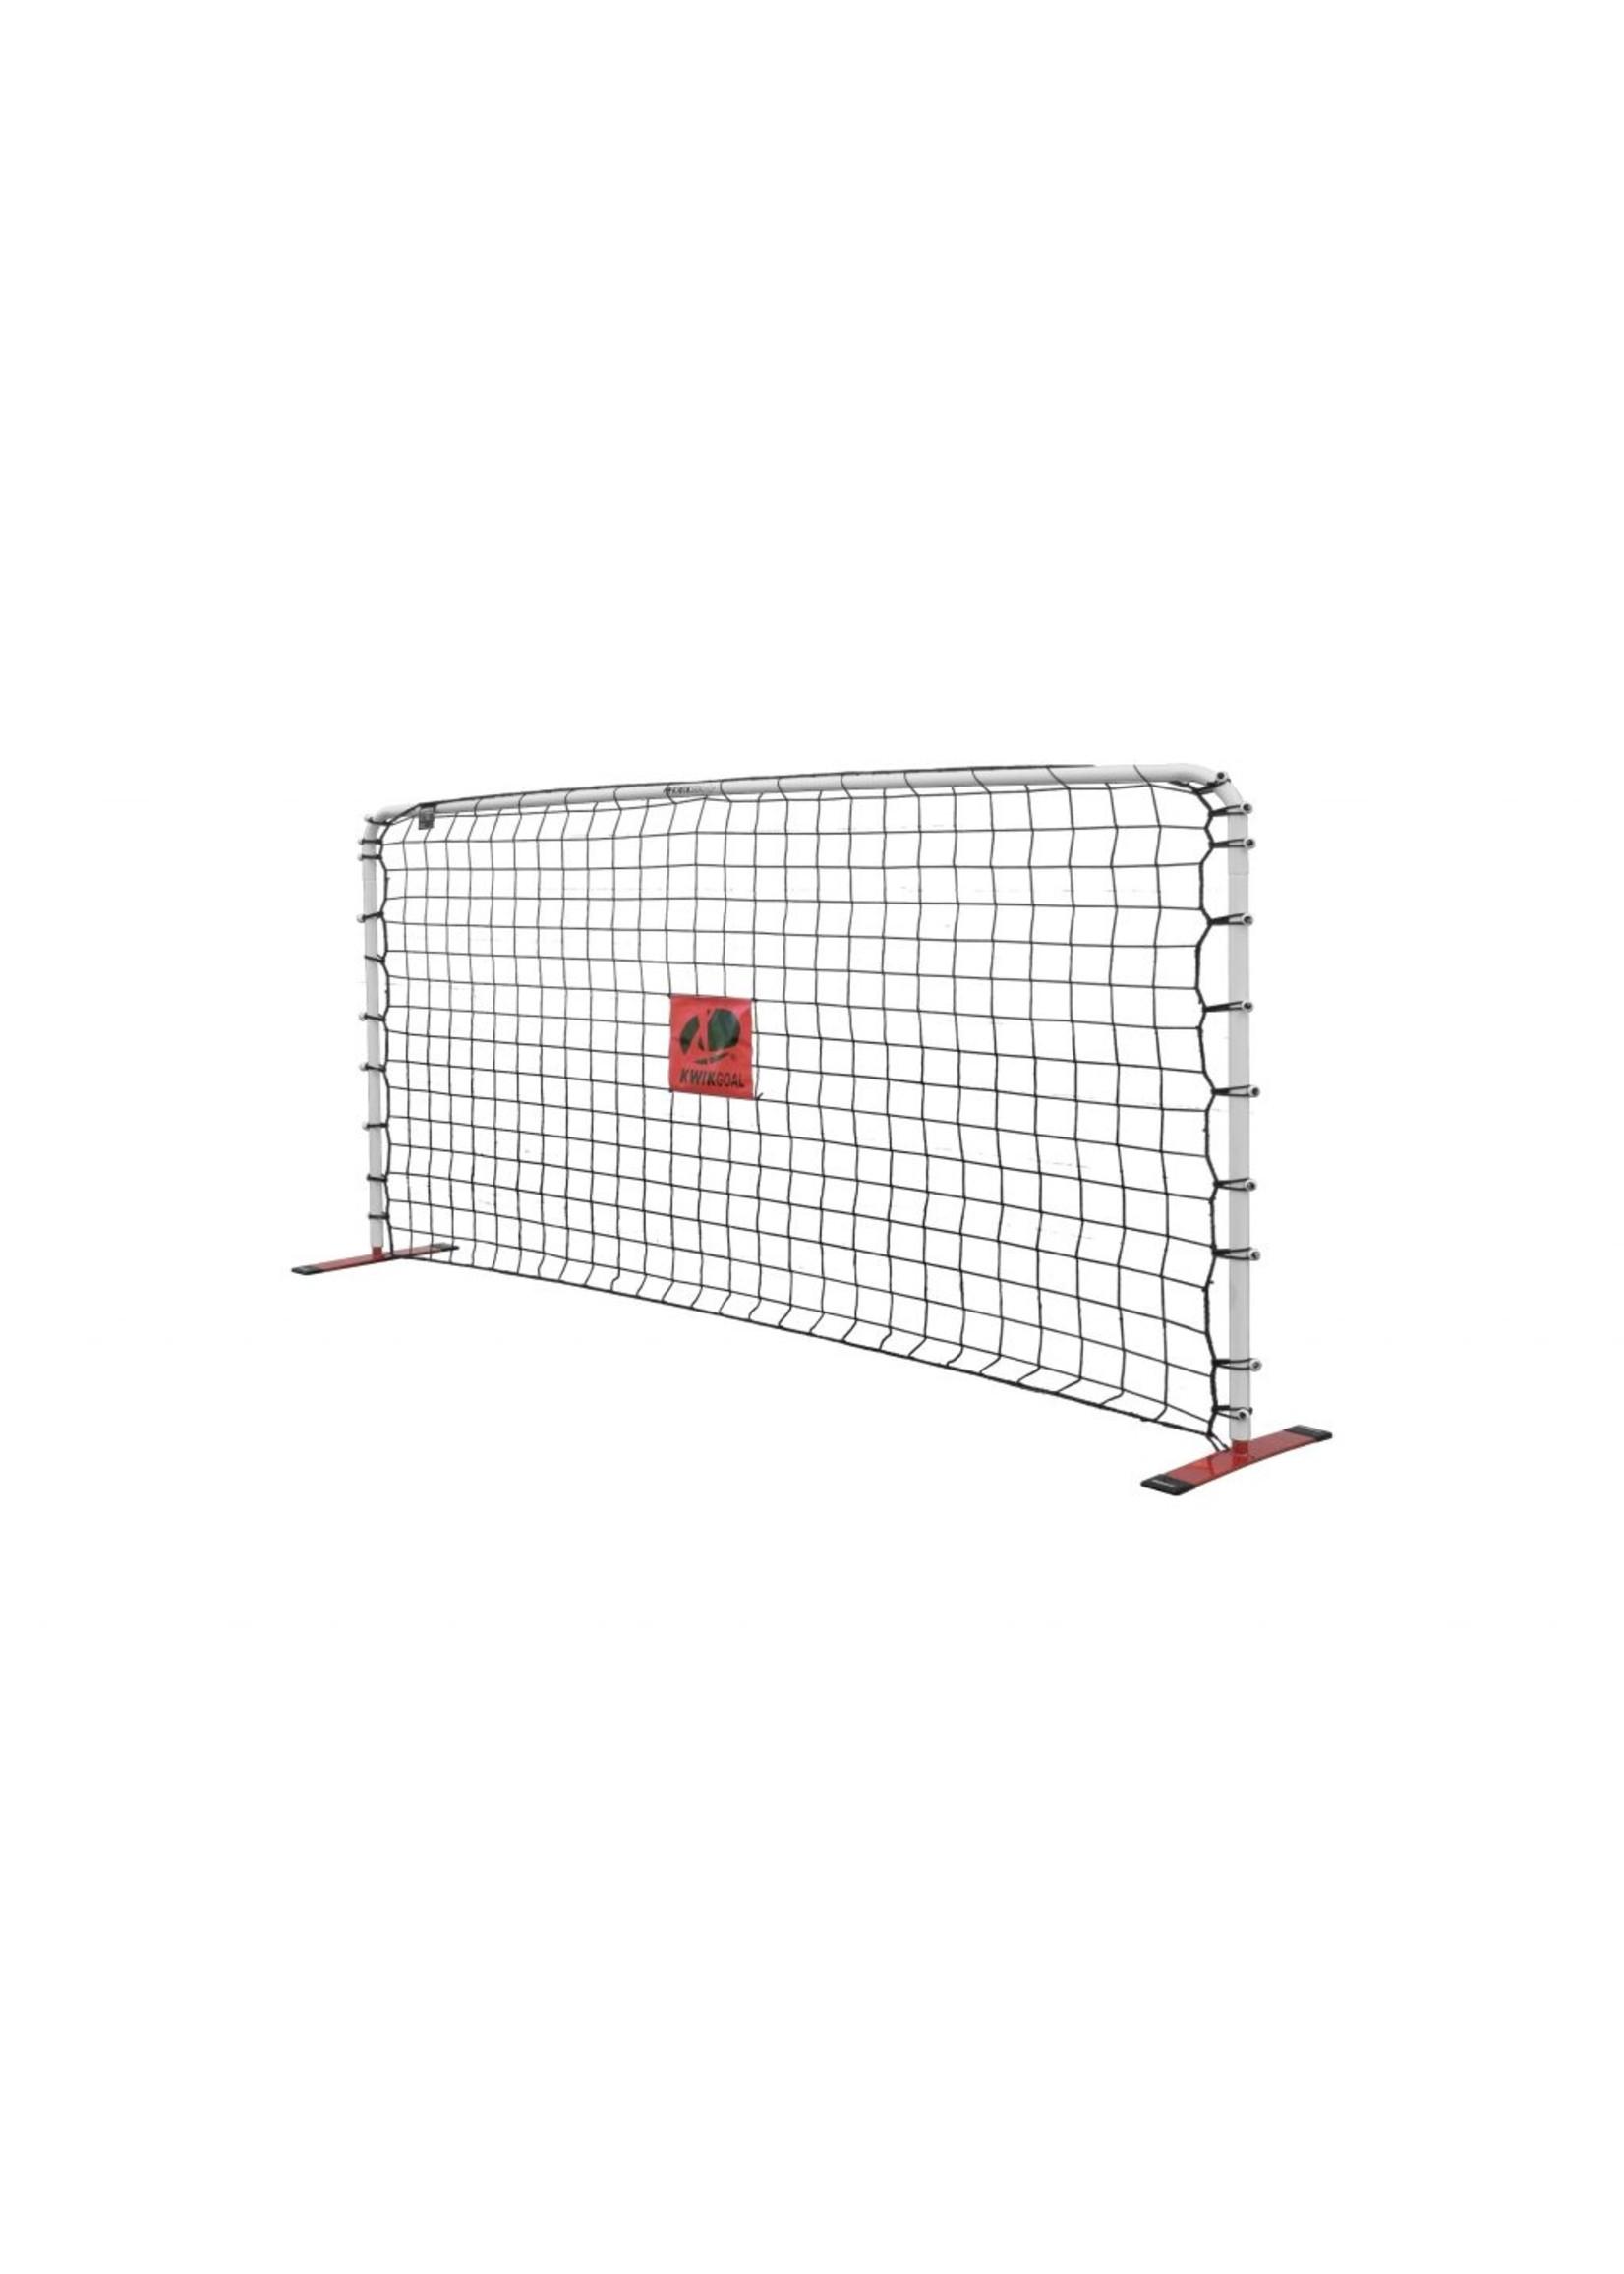 Kwik Goal AFR-2 Rebounder 5x10